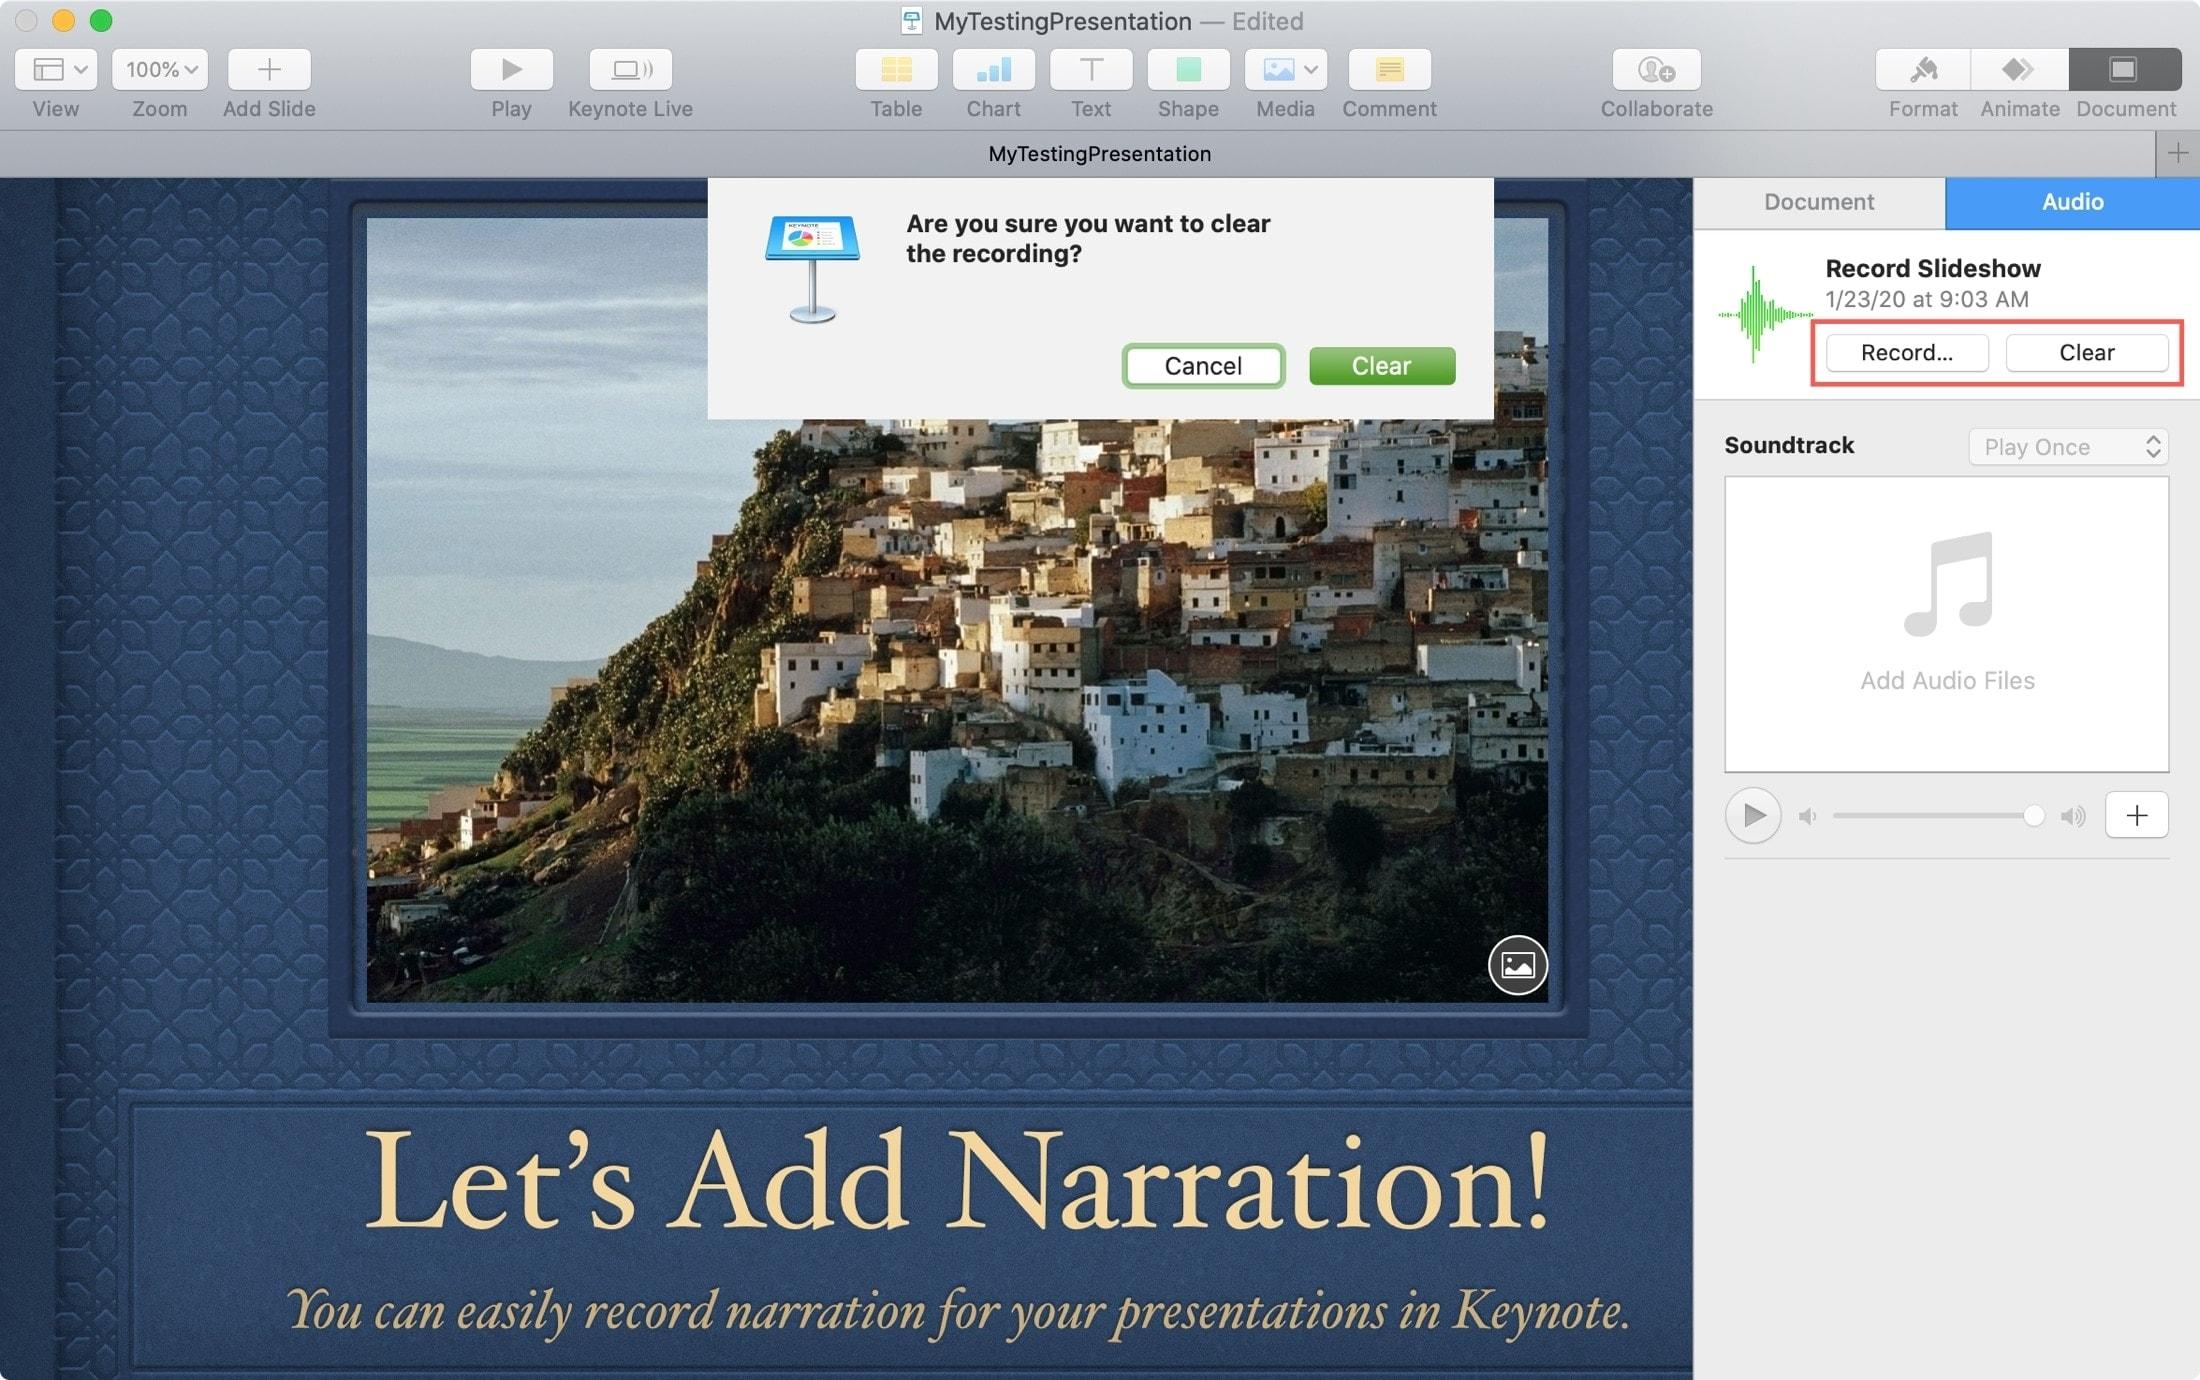 Rerecord Clear Narration Keynote Mac